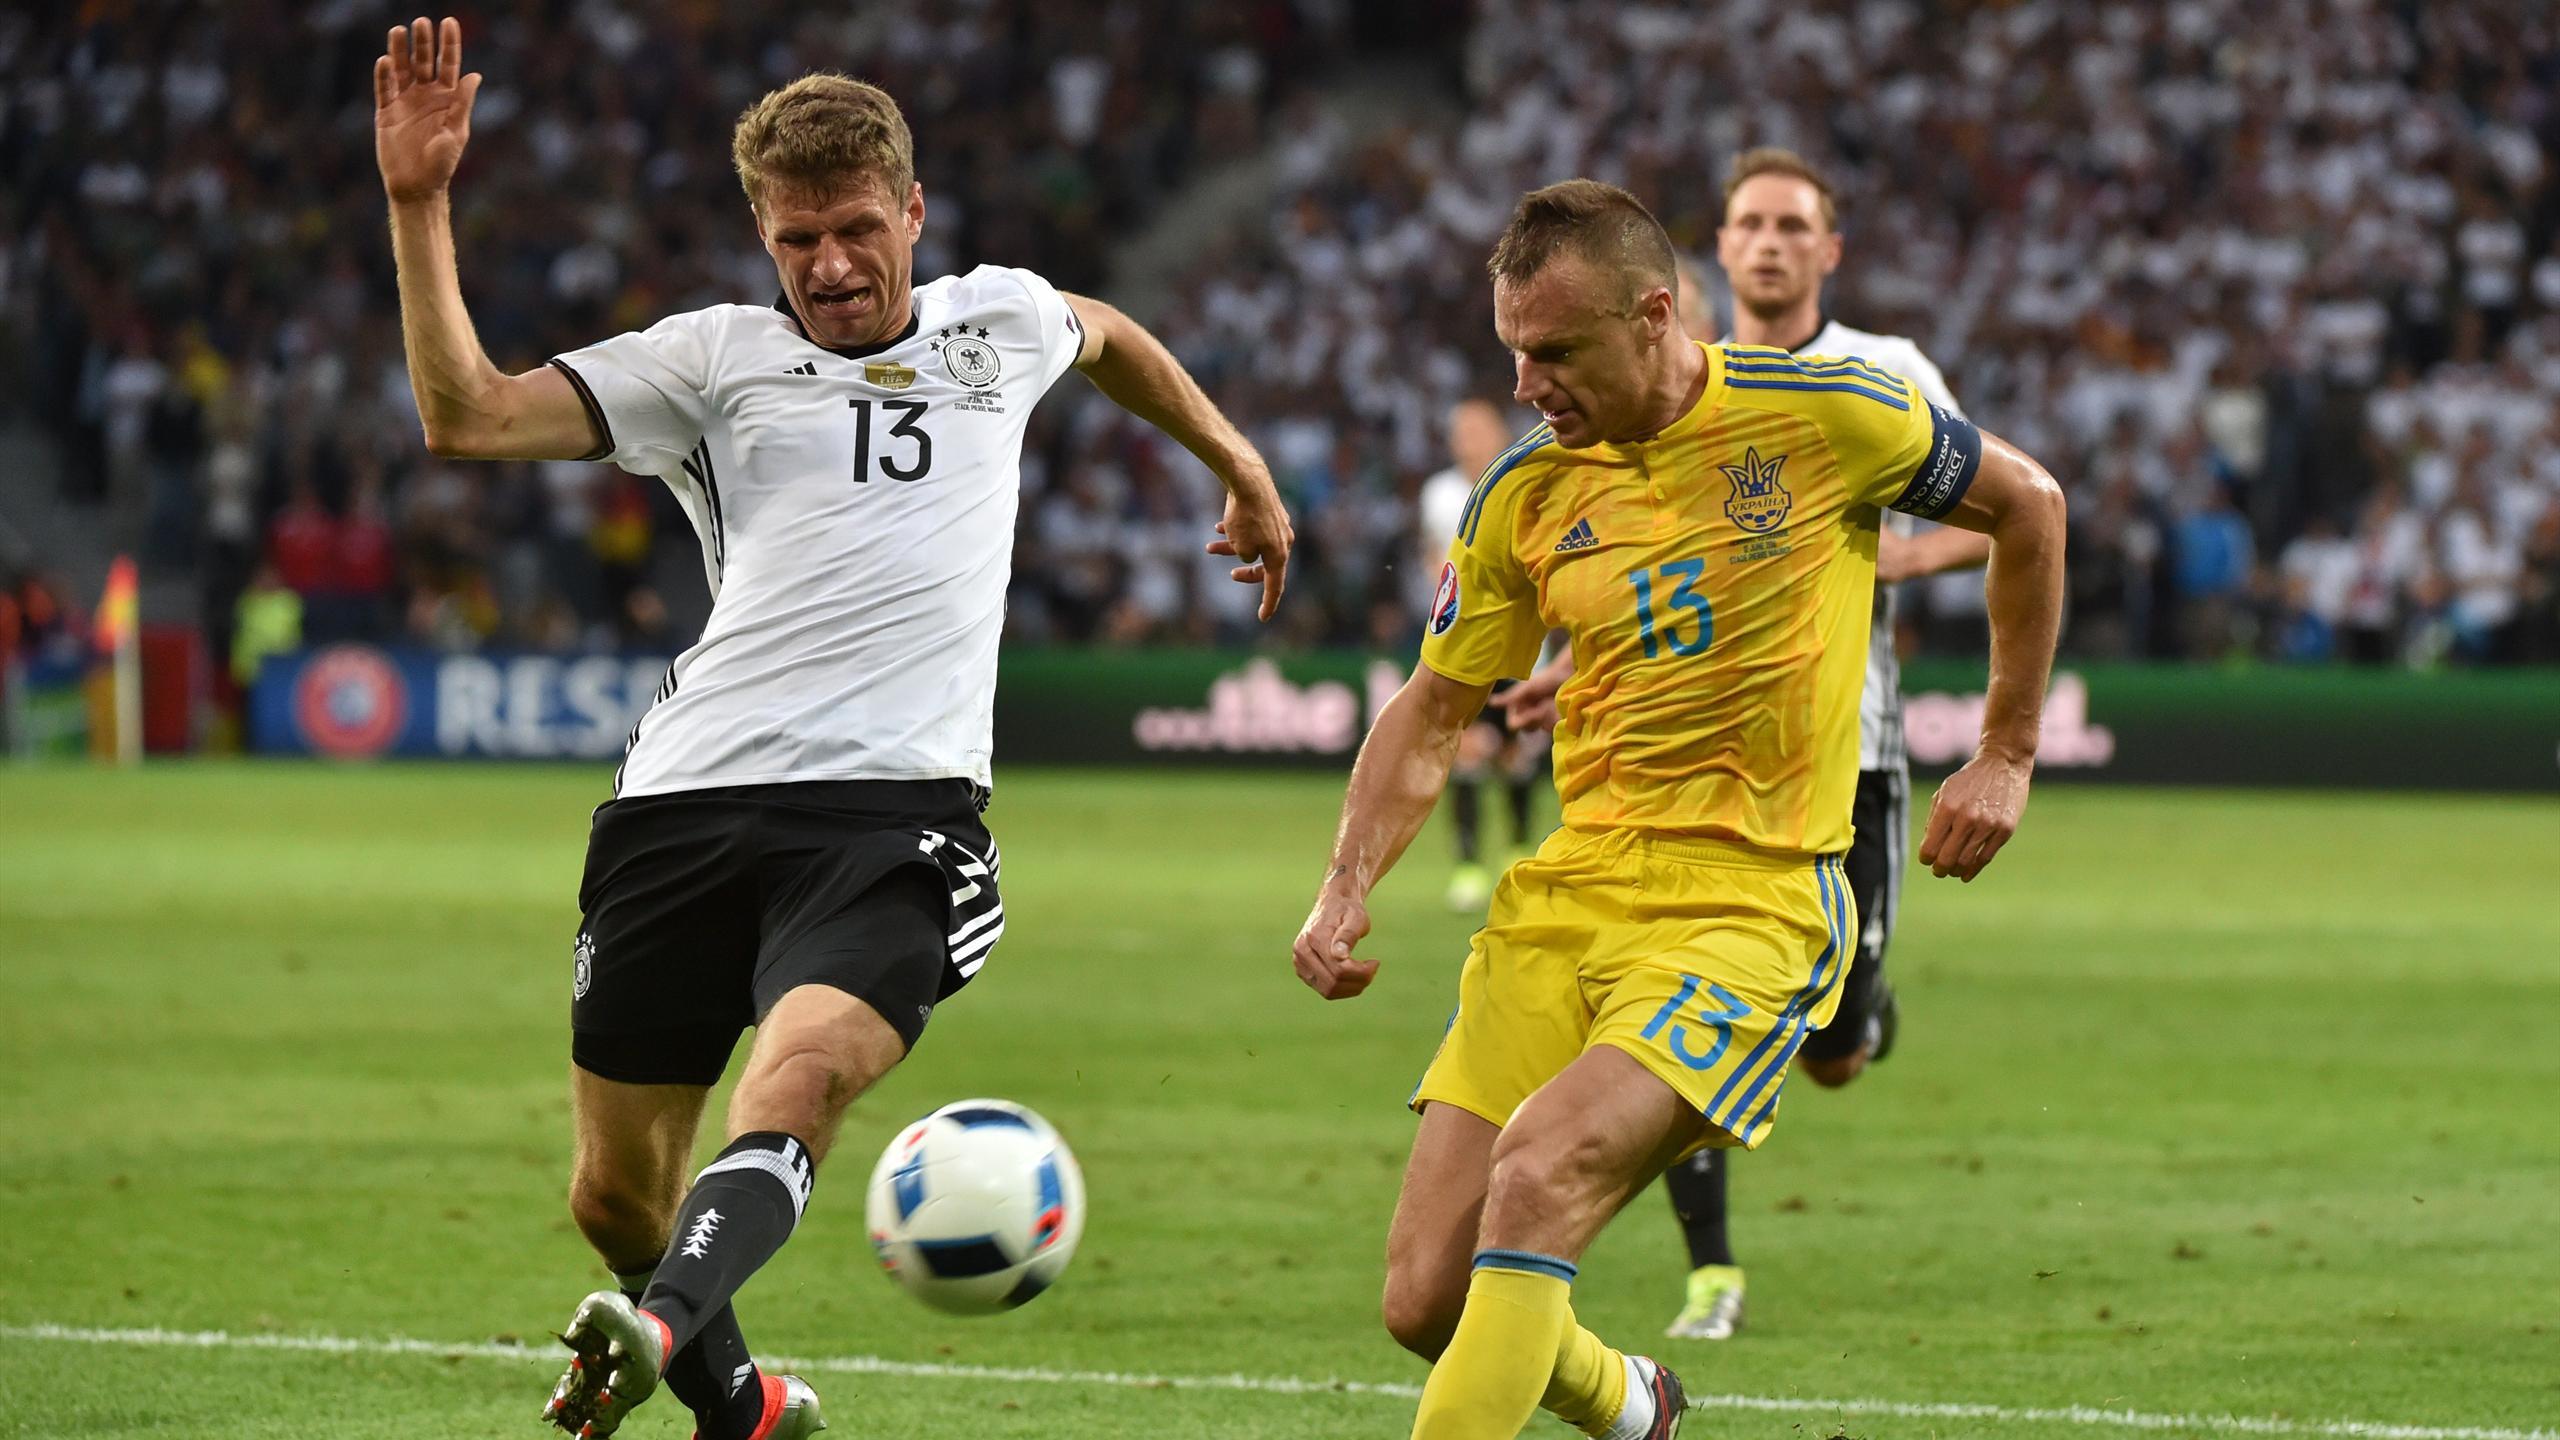 Ukraine's defender Vyacheslav Shevchuk (R) challenges Germany's midfielder Thomas Mueller during the Euro 2016 group C football match between Germany and Ukraine